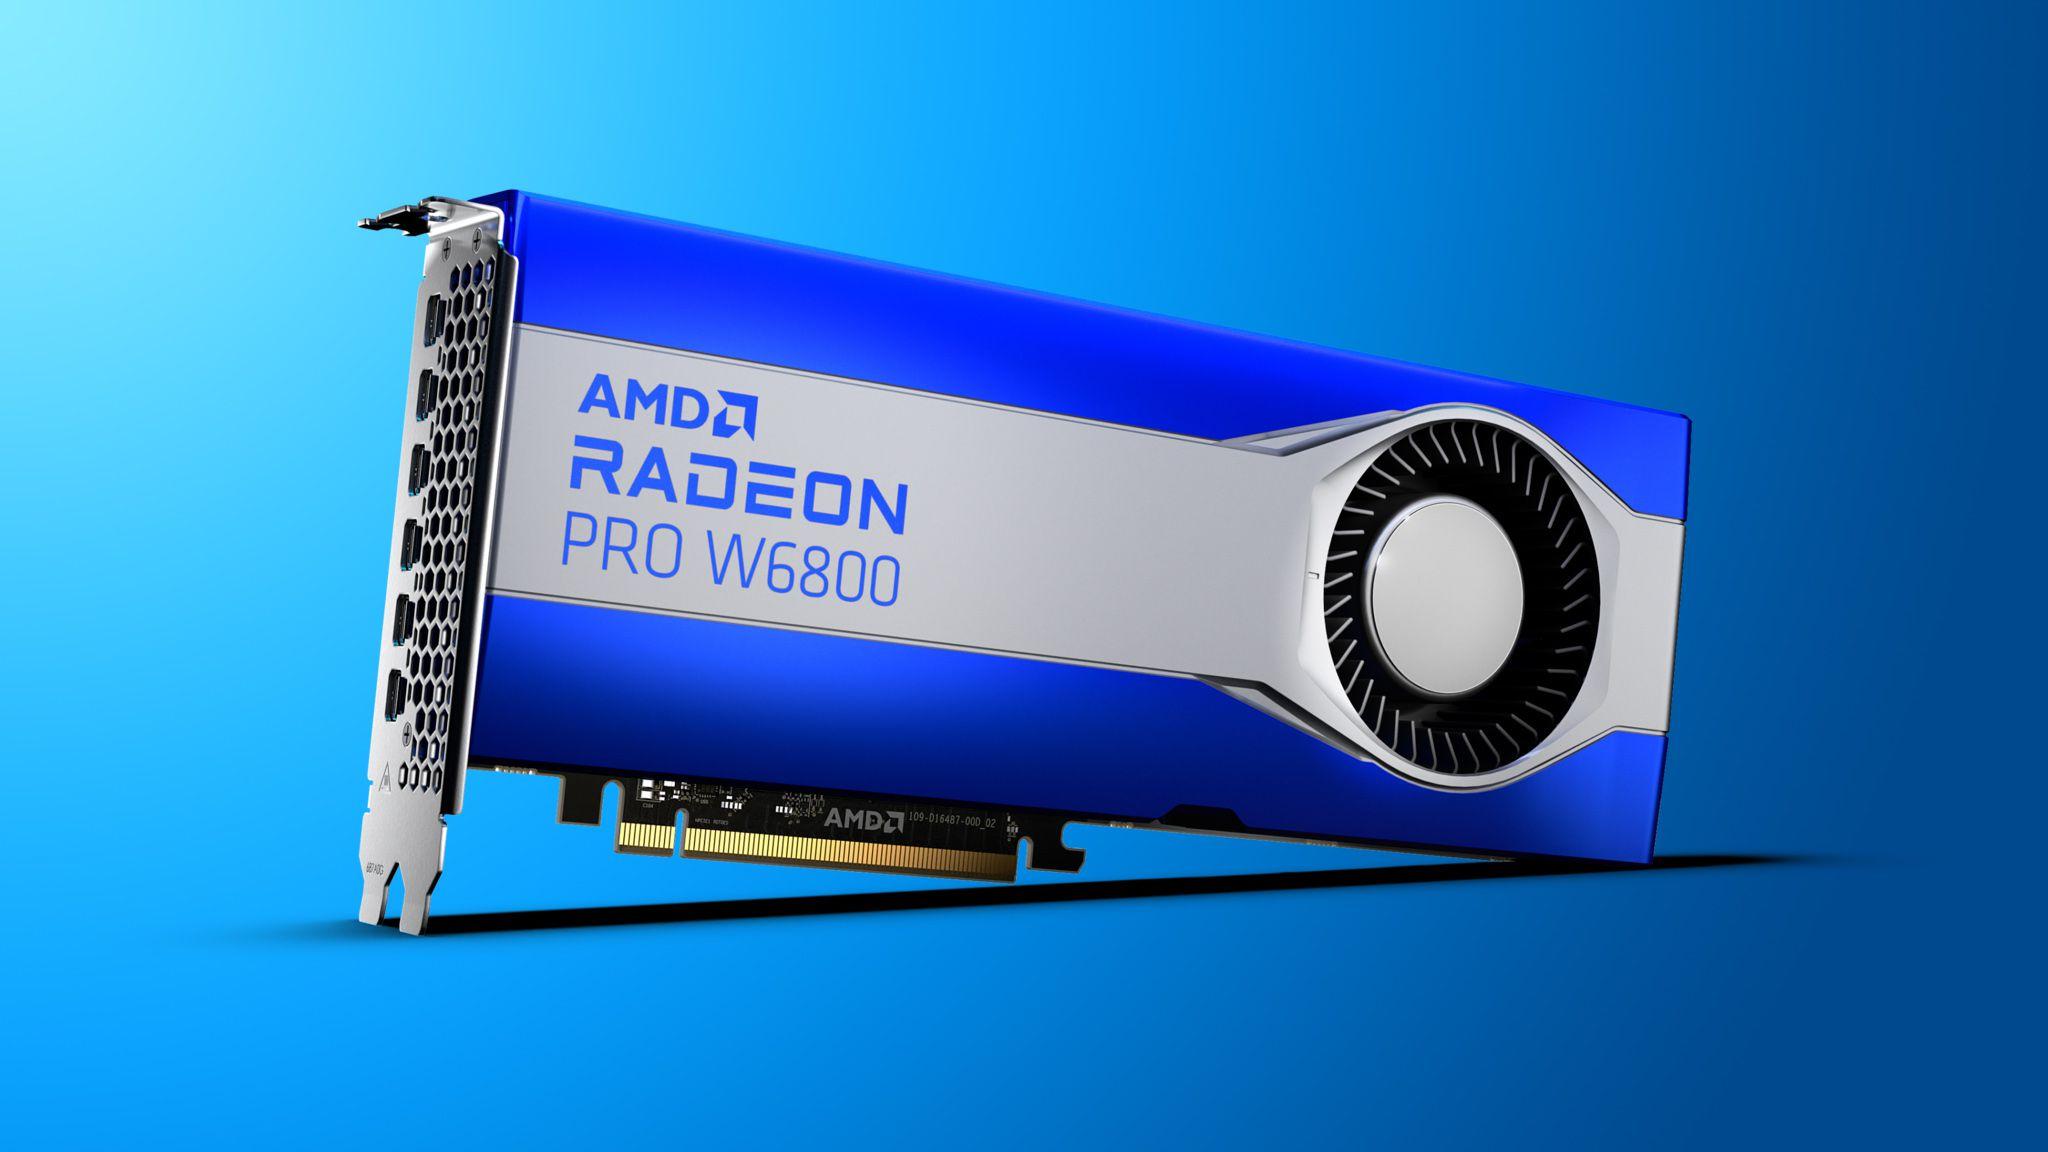 AMD رادئون پرو W6000